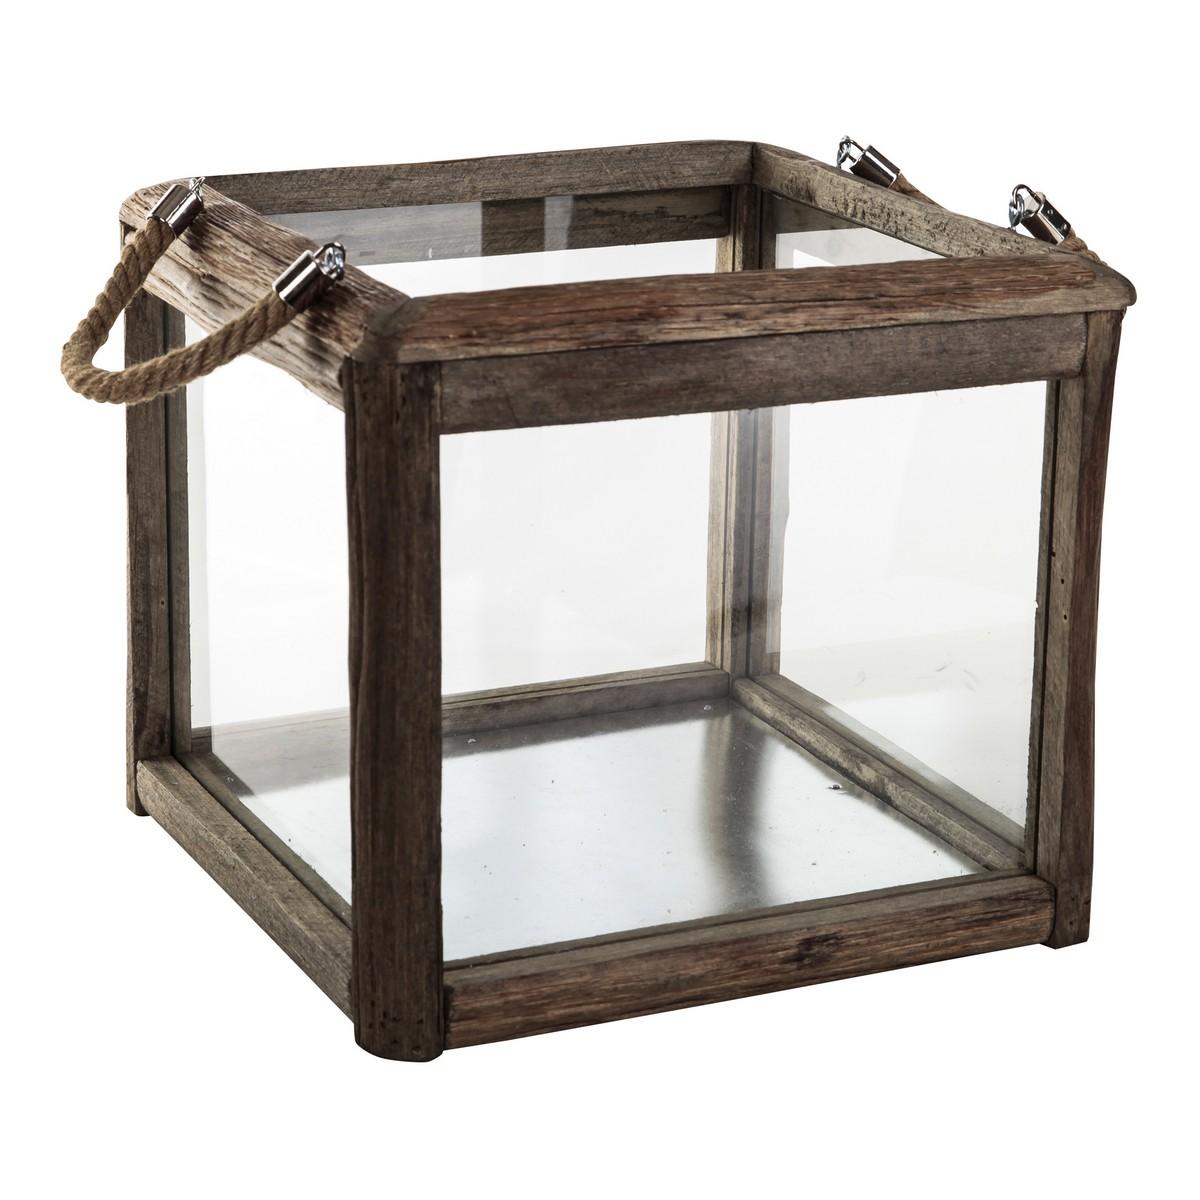 PTMD/Houston brown wood lantern glass/662187【01】【取寄】